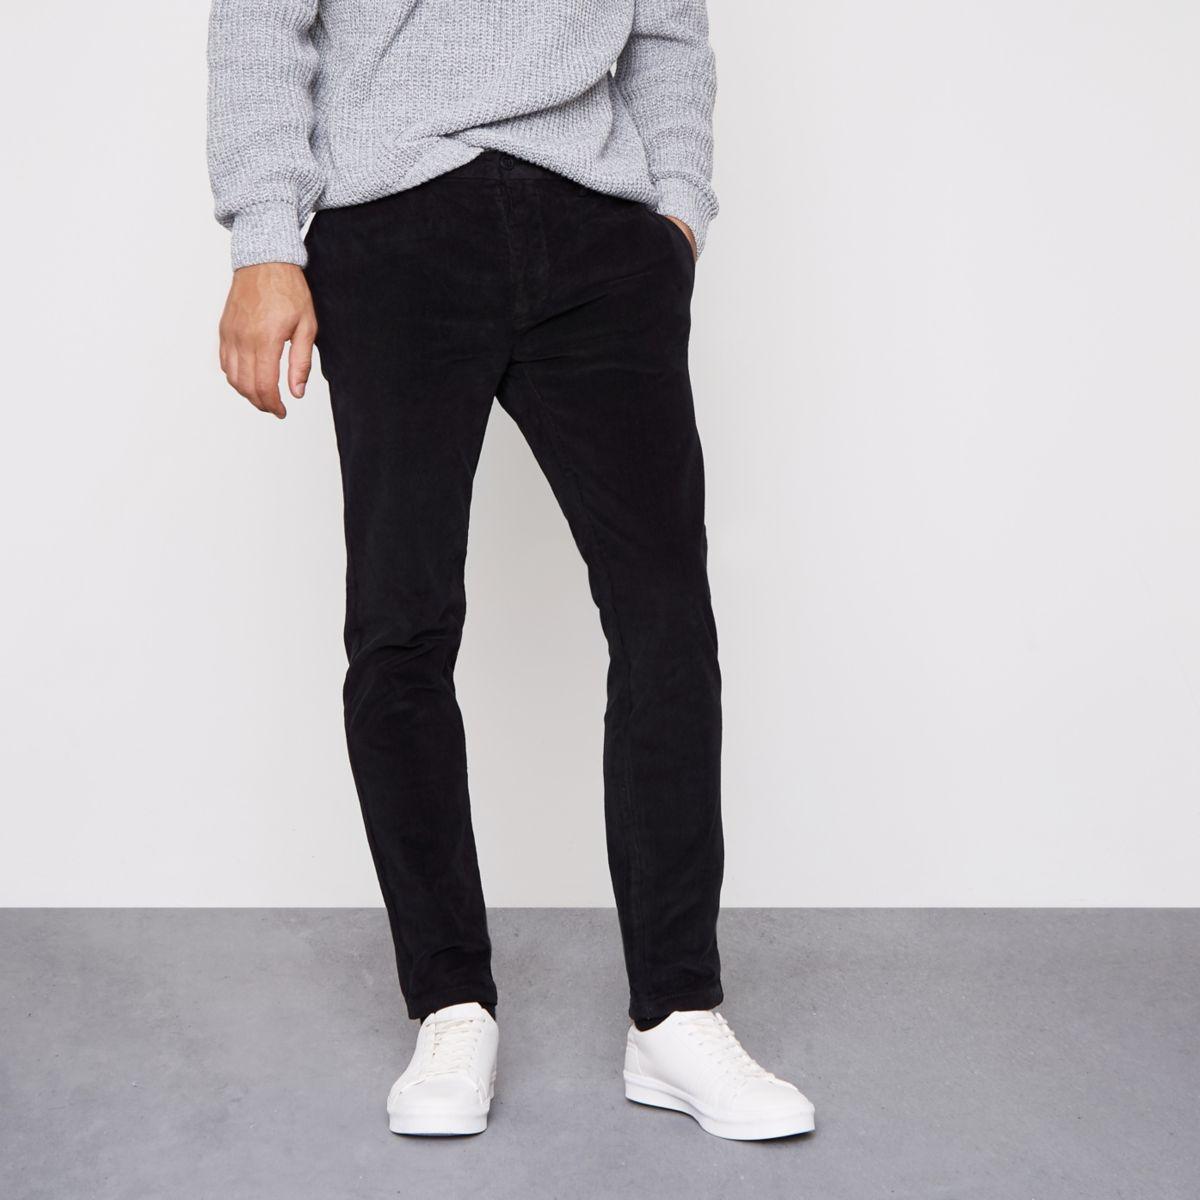 Black cord skinny smart pants